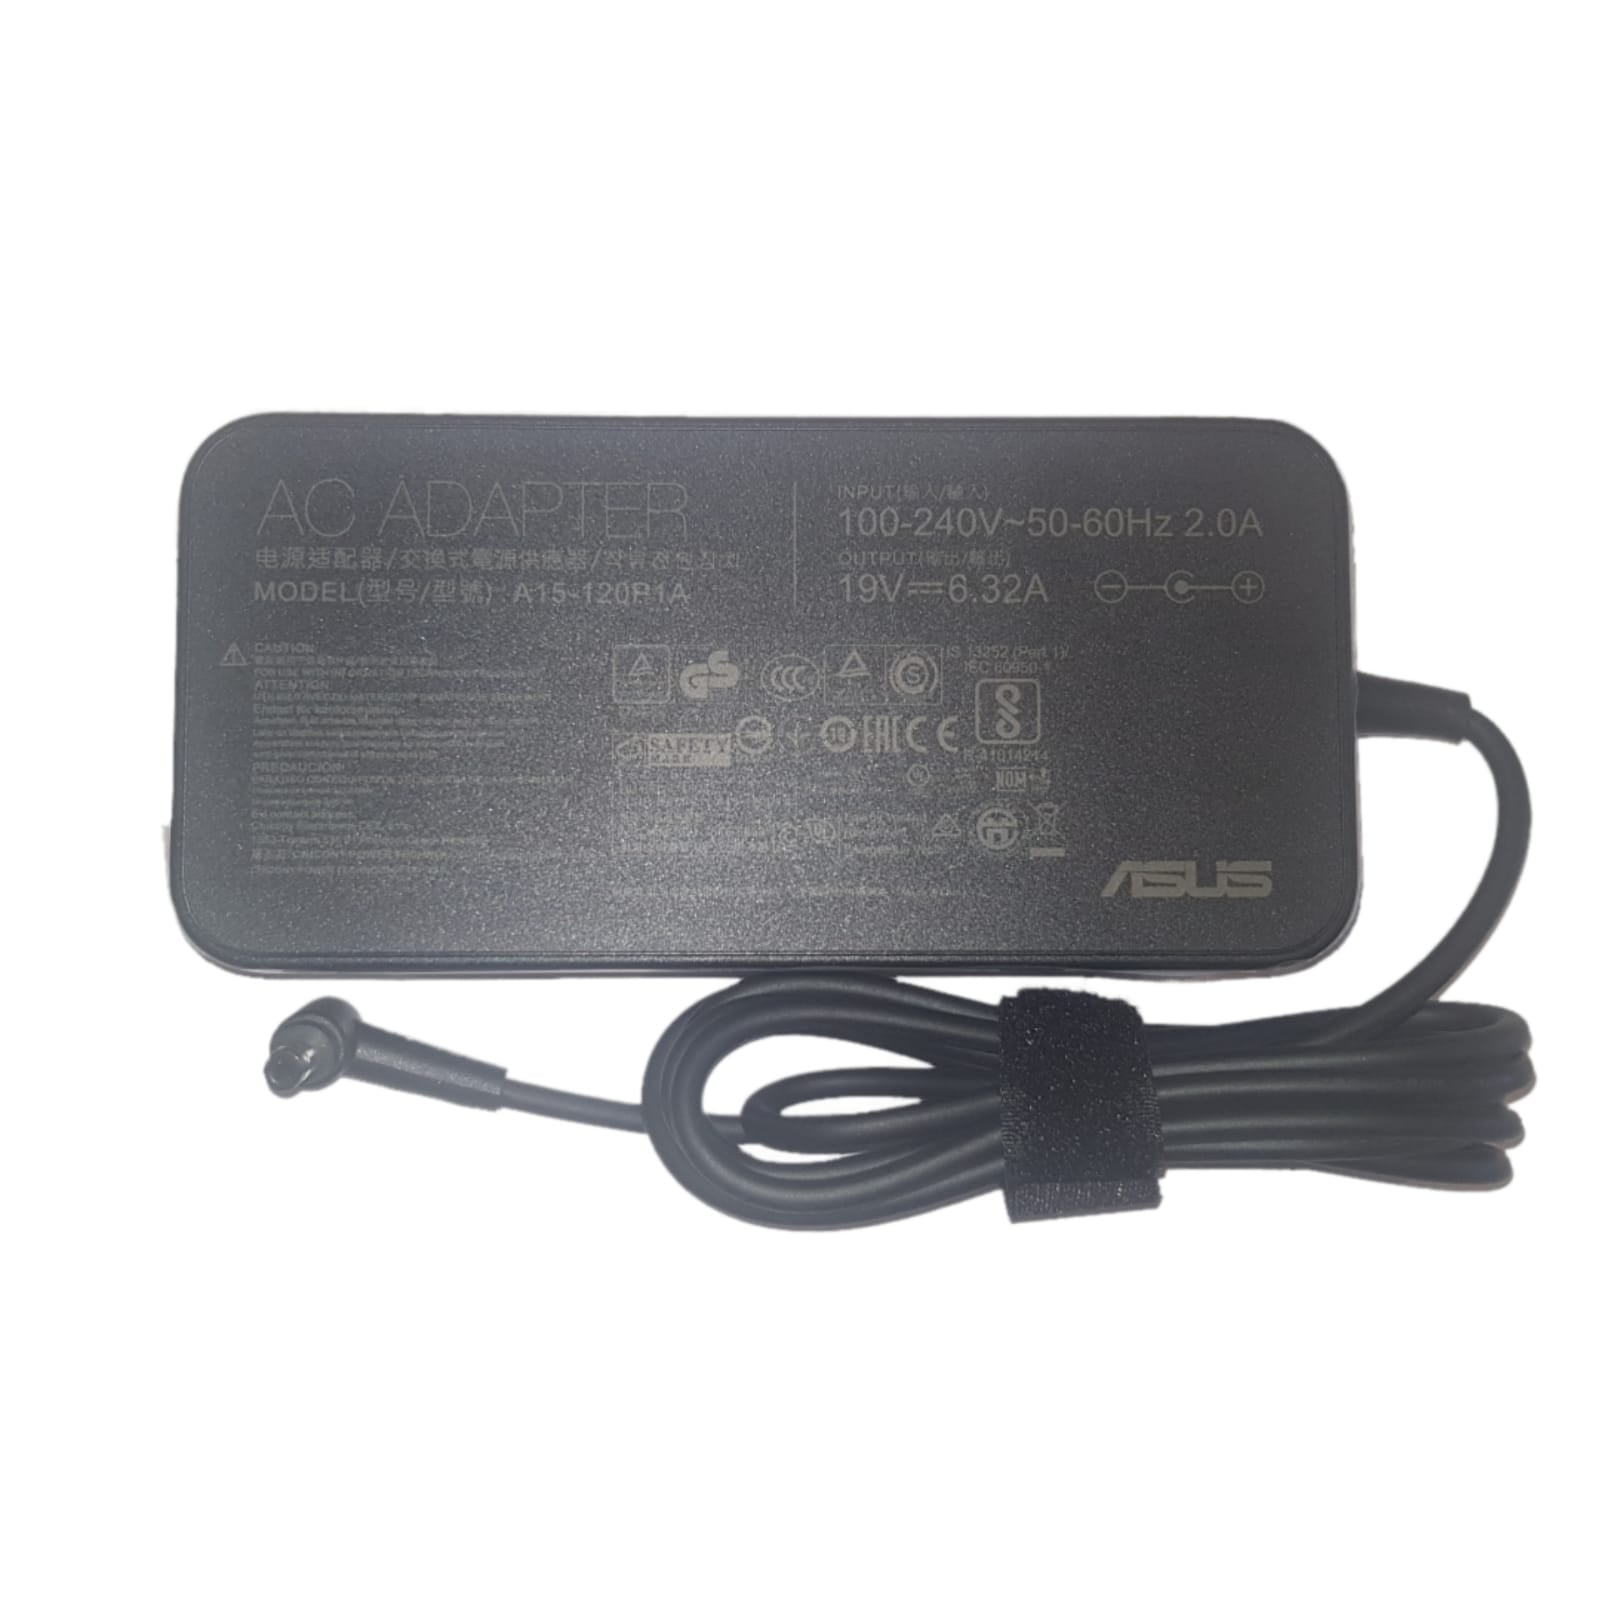 מטען למחשב נייד אסוס Asus K750LN